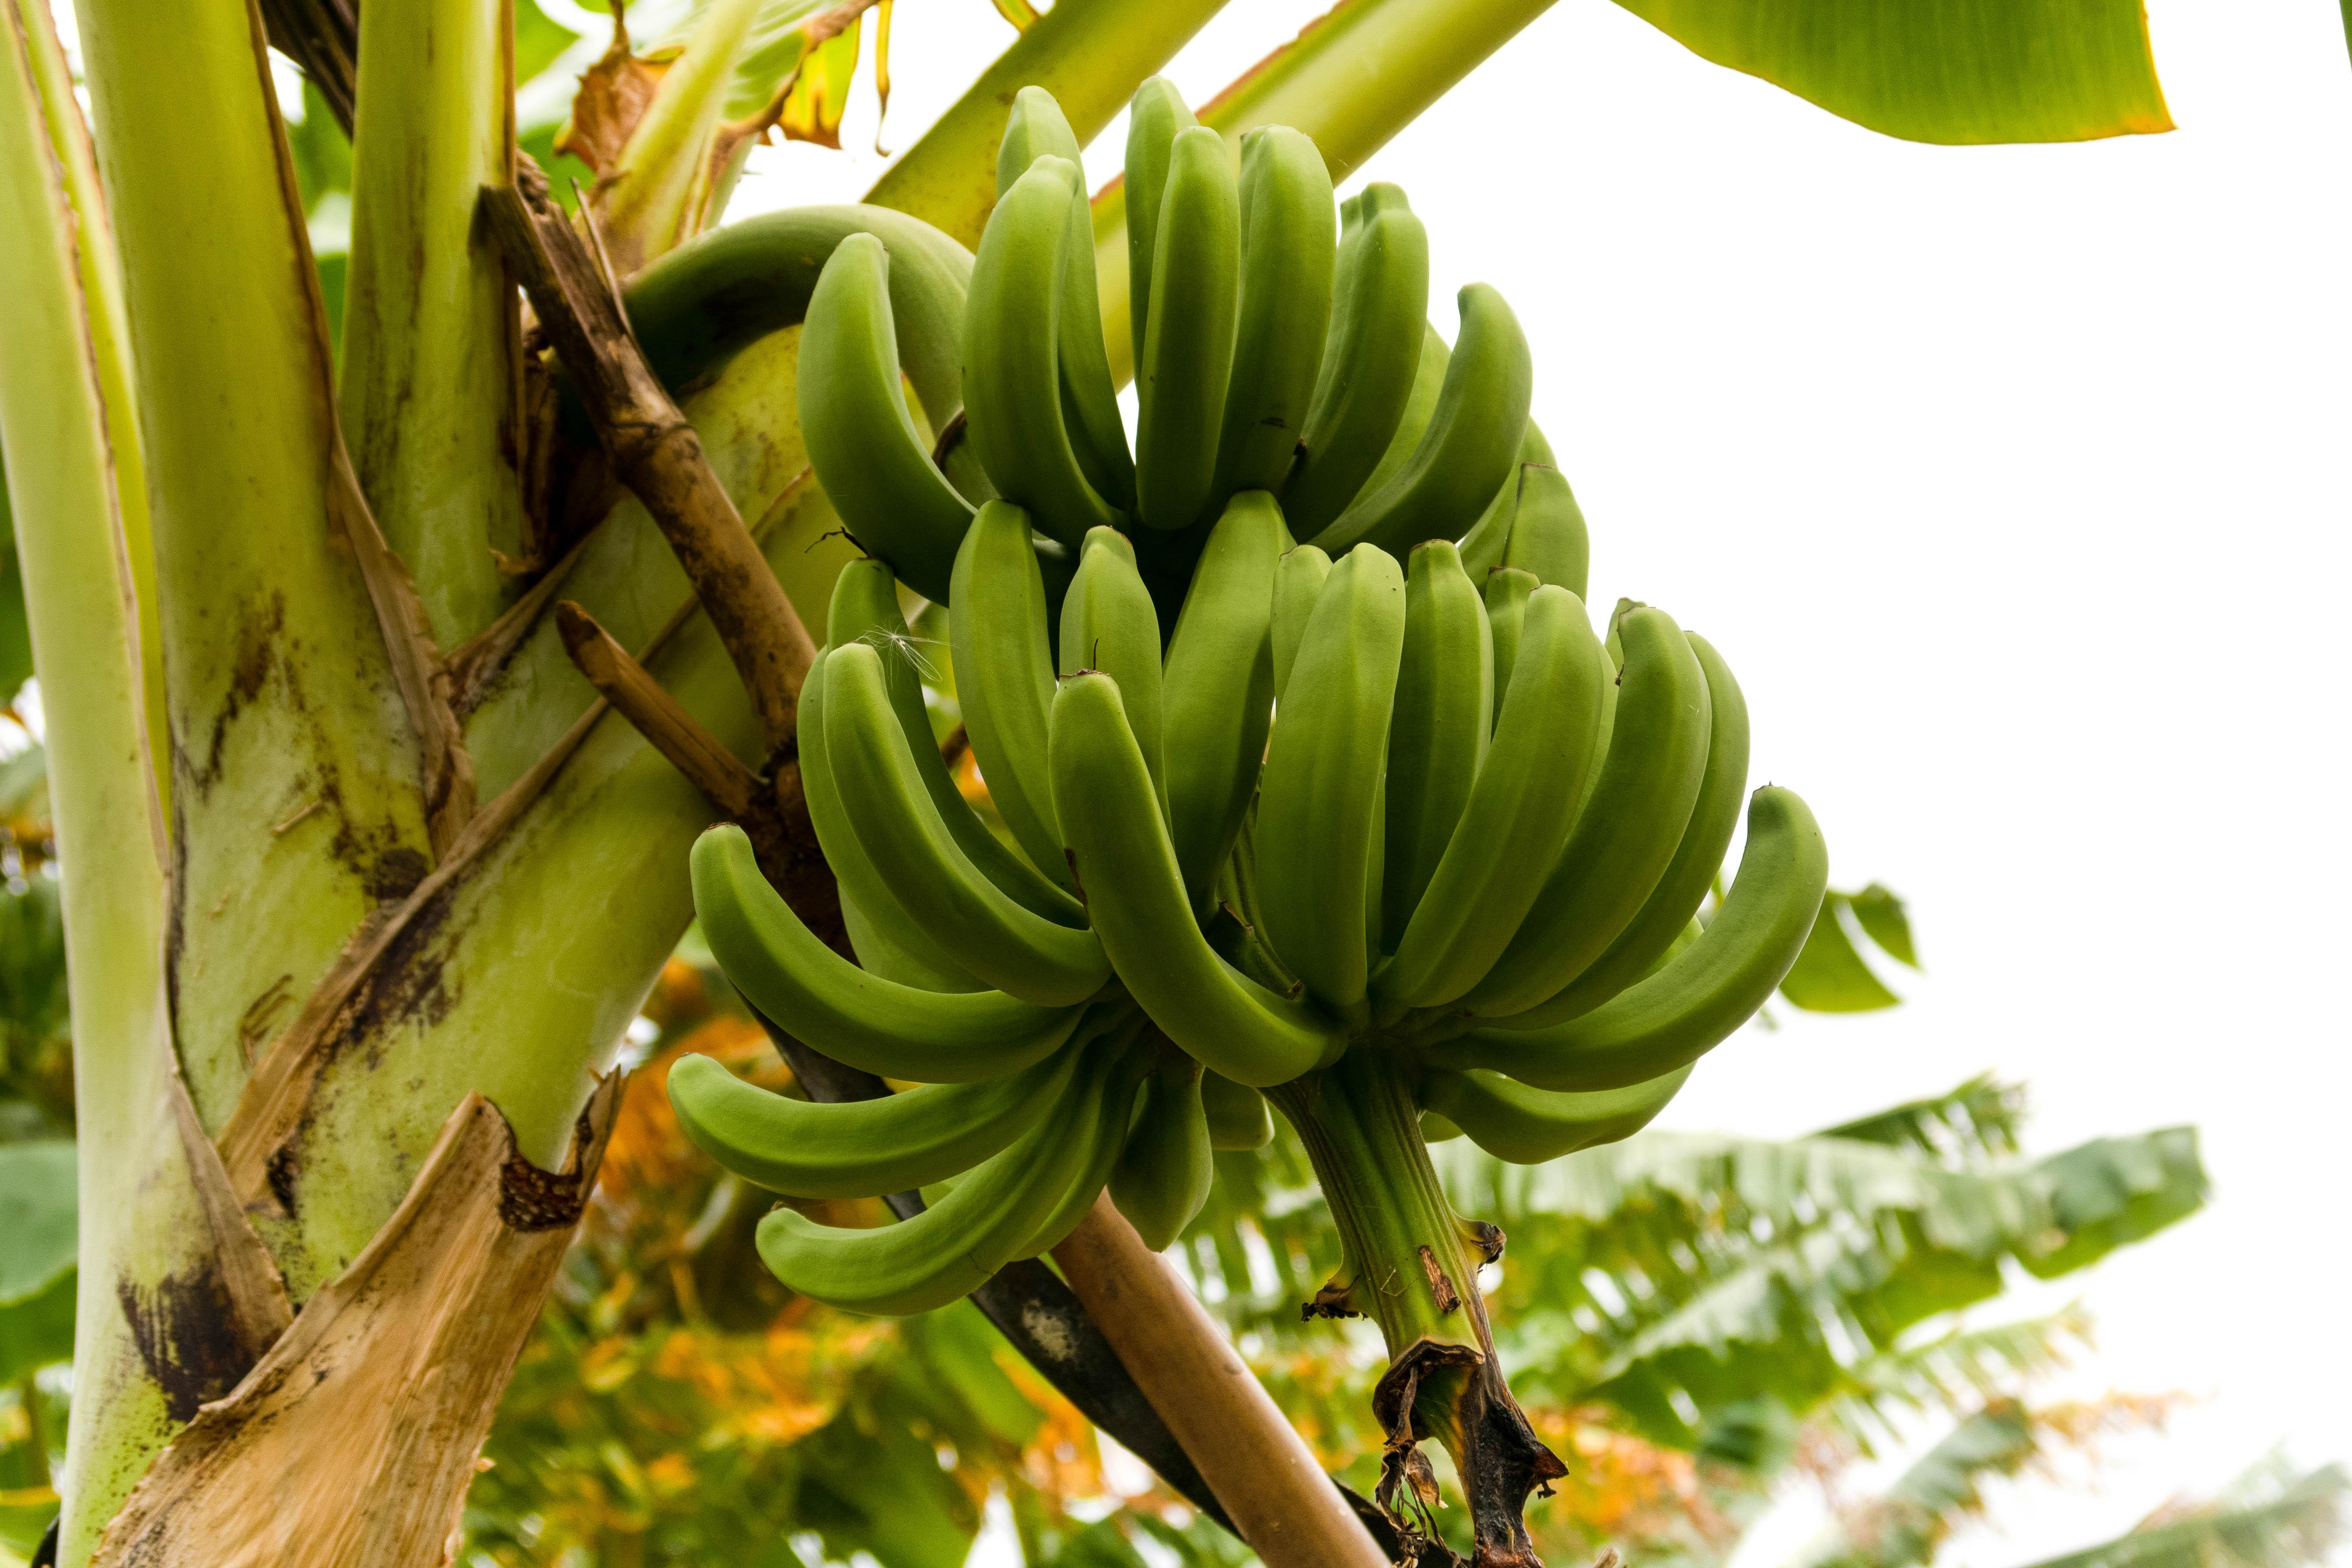 Bananes sur arbre - FRUITS & LÉGUMES